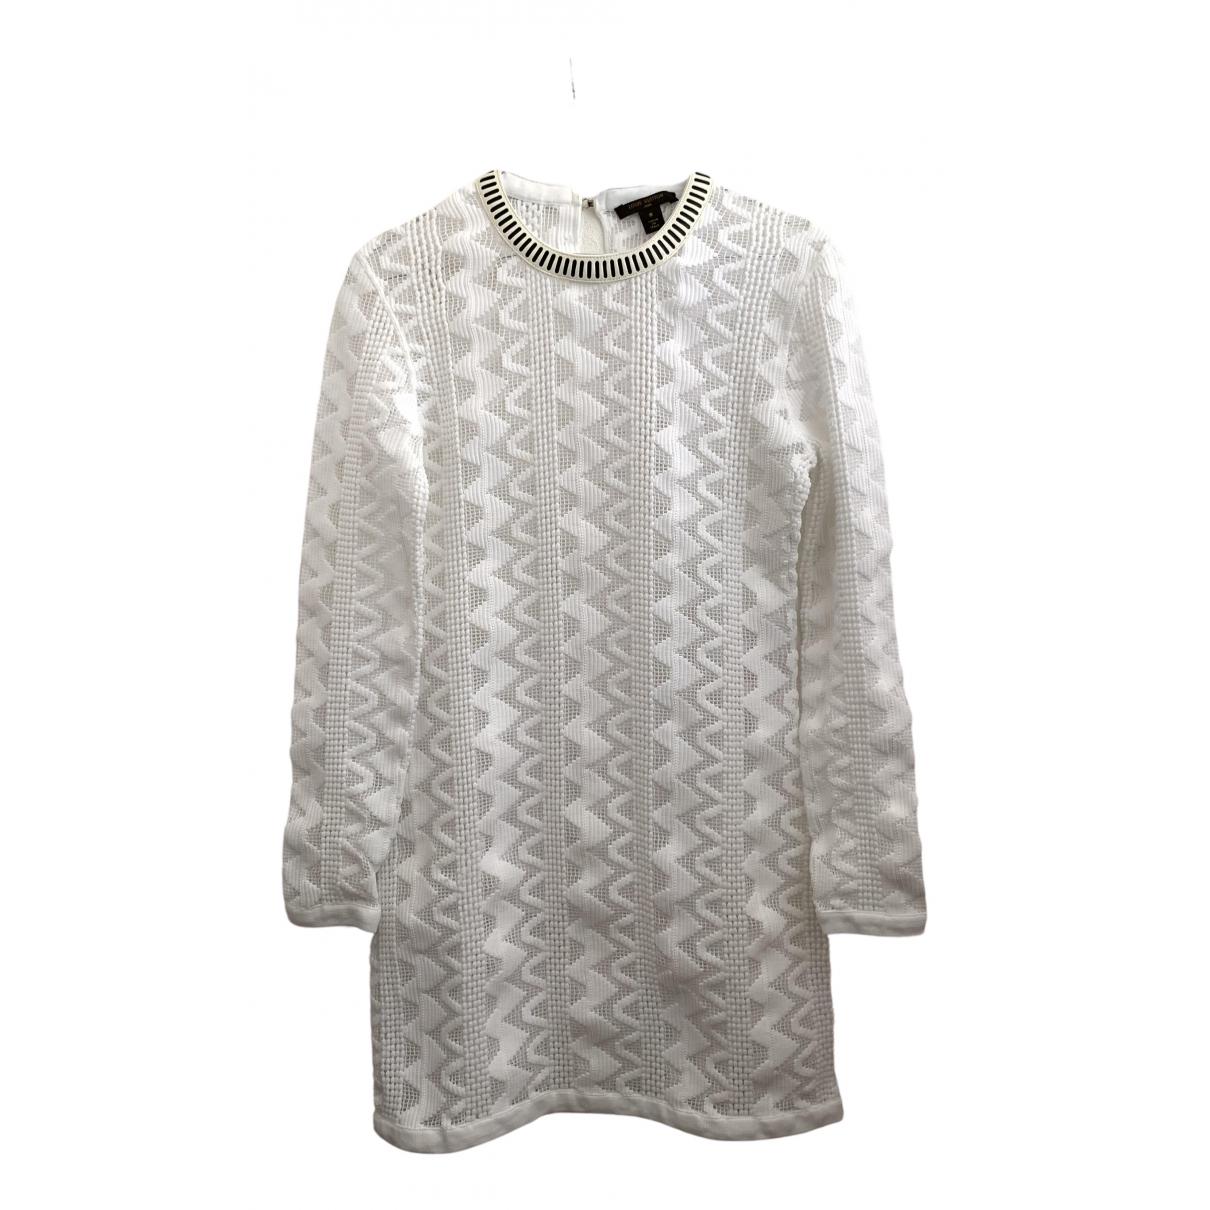 Louis Vuitton \N Kleid in  Weiss Baumwolle